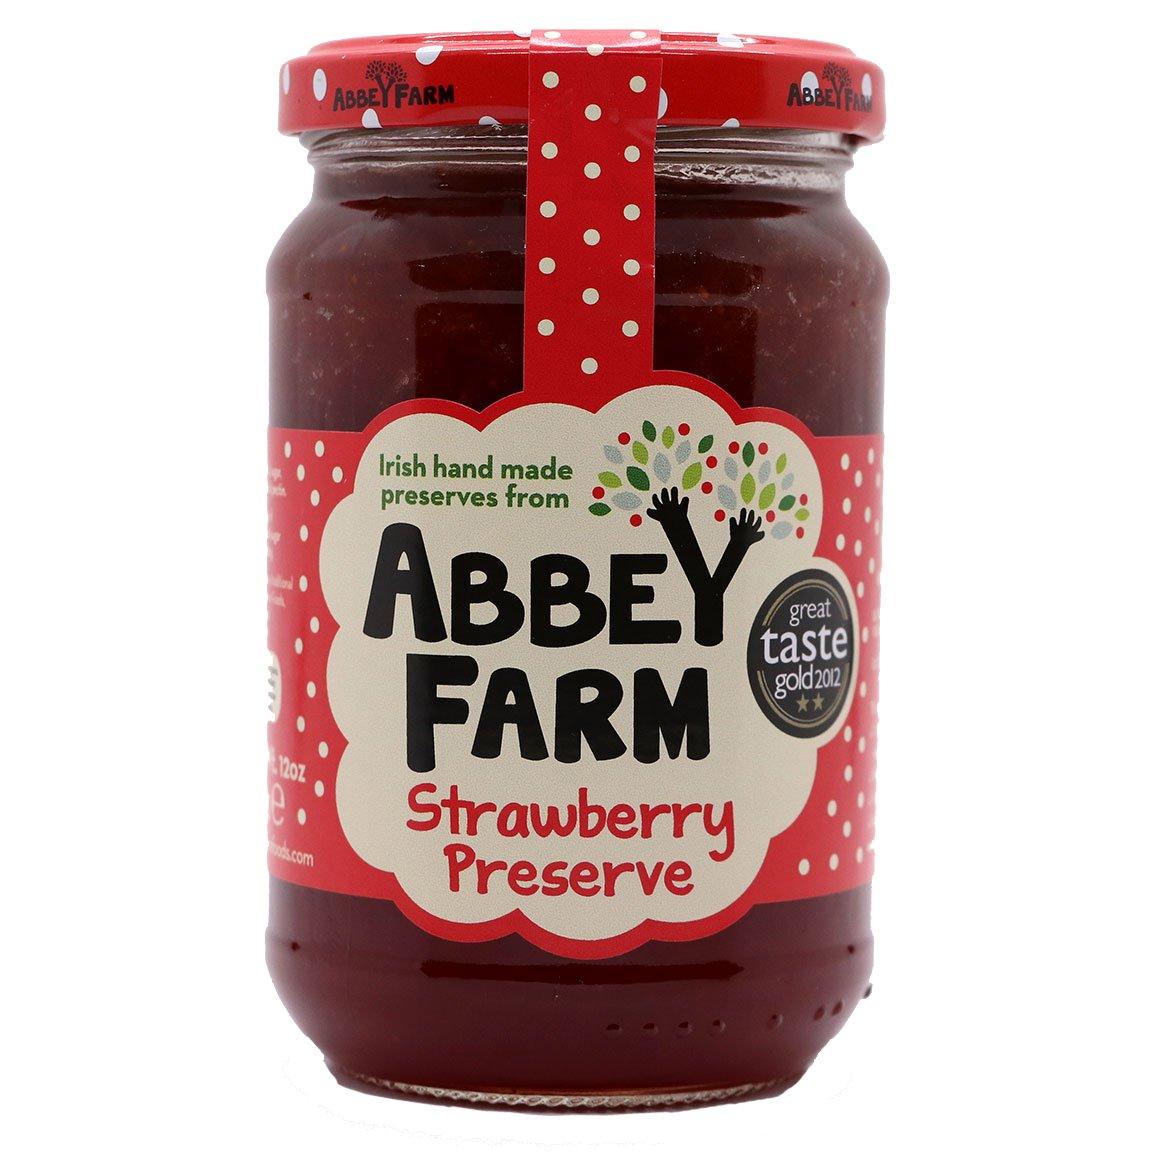 Abbey Farm Strawberry Preserve